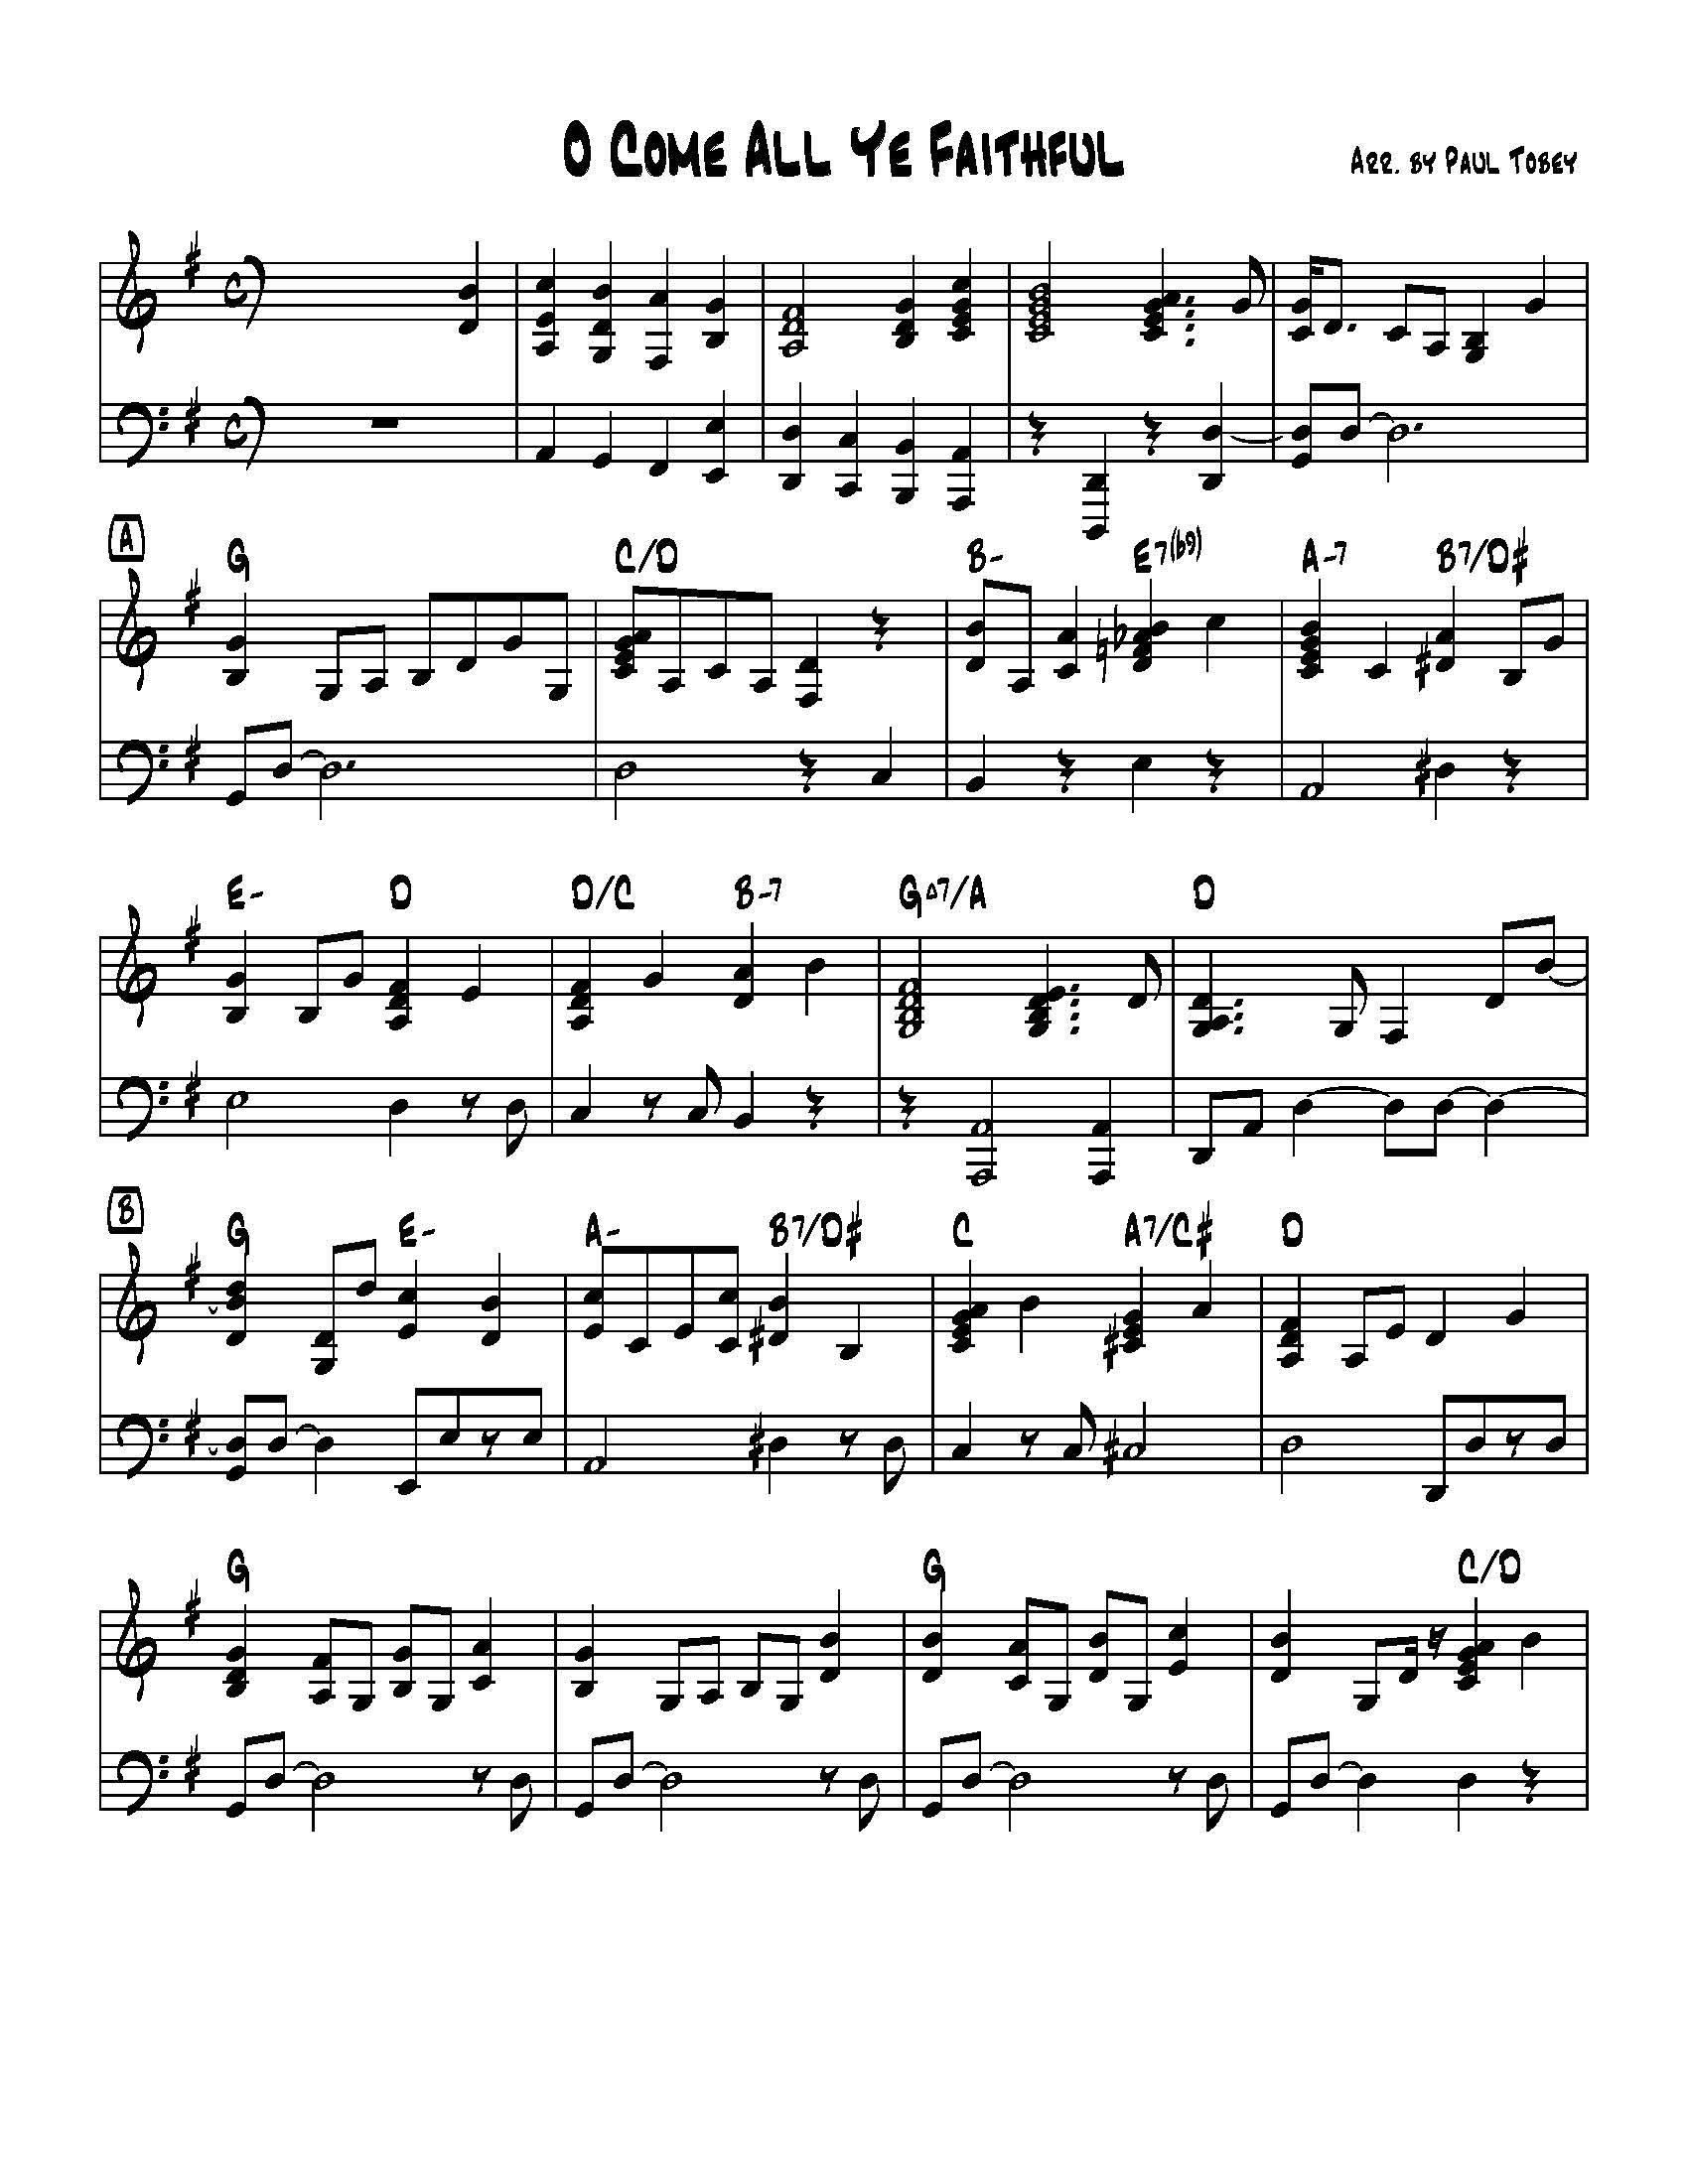 O Come All Ye Faithful - Sheet Music PDF - Paul Tobey